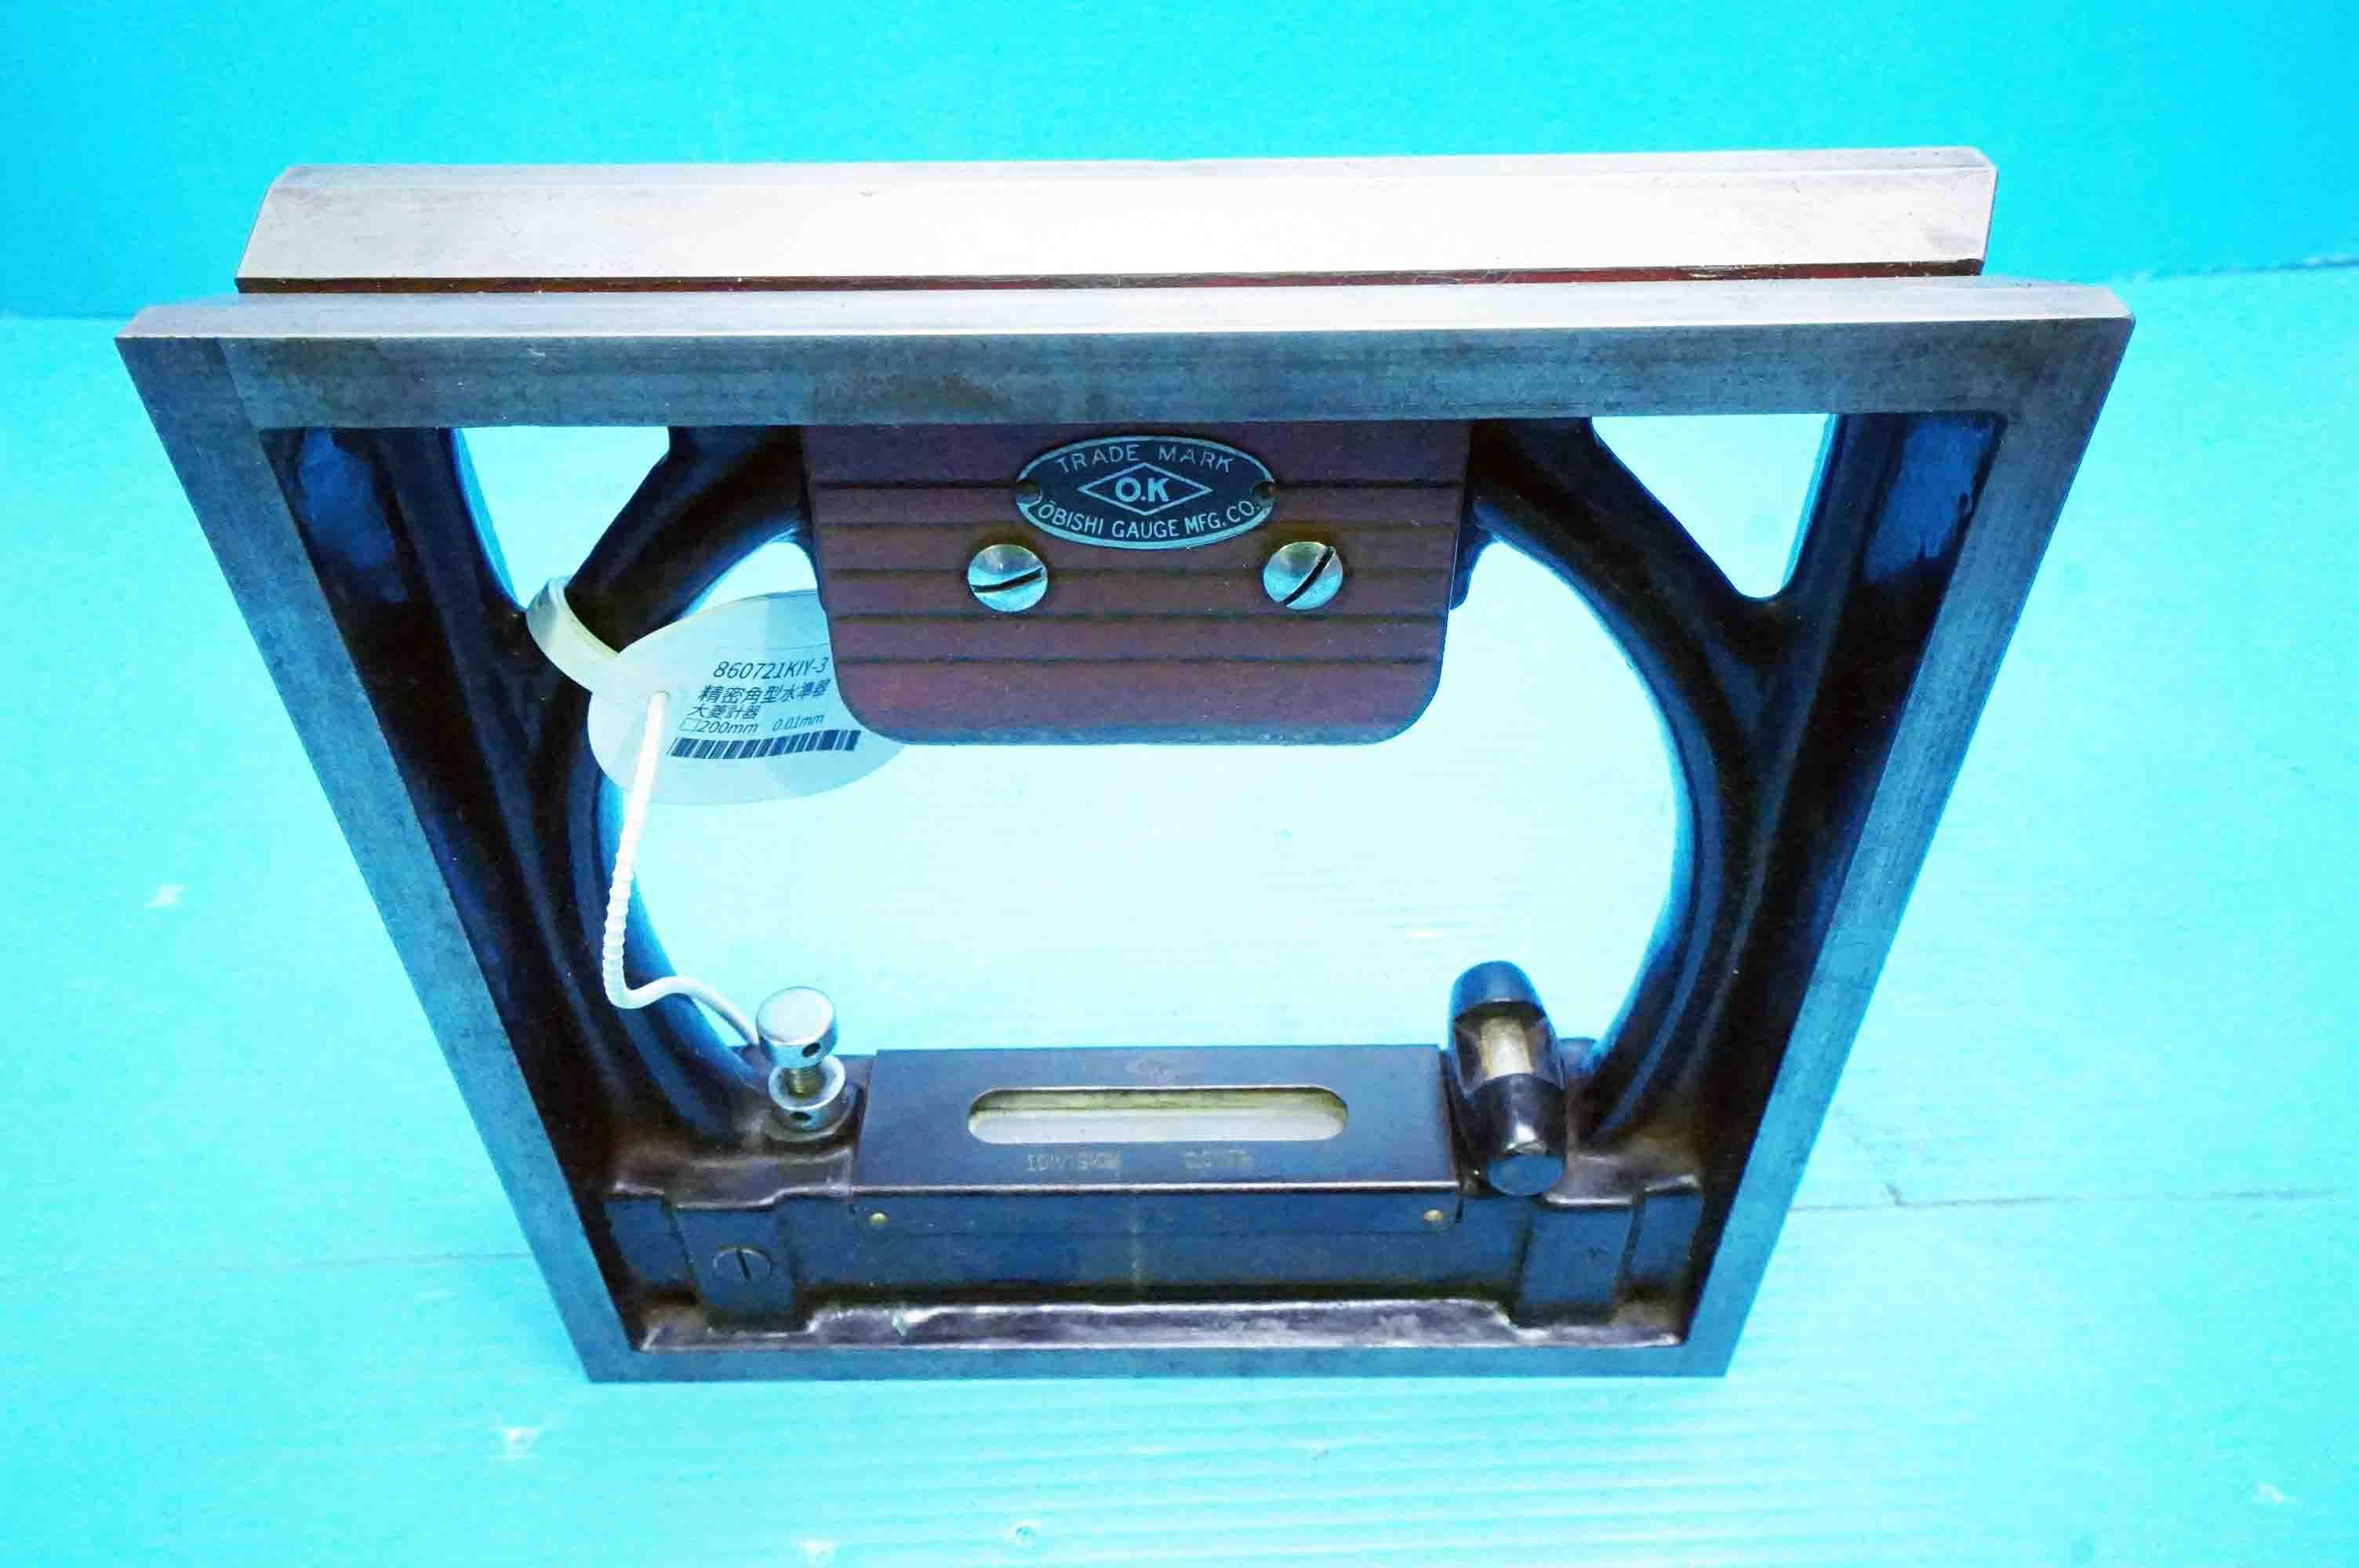 精密角型水準器 大菱計器 (860721KIY-3)の画像